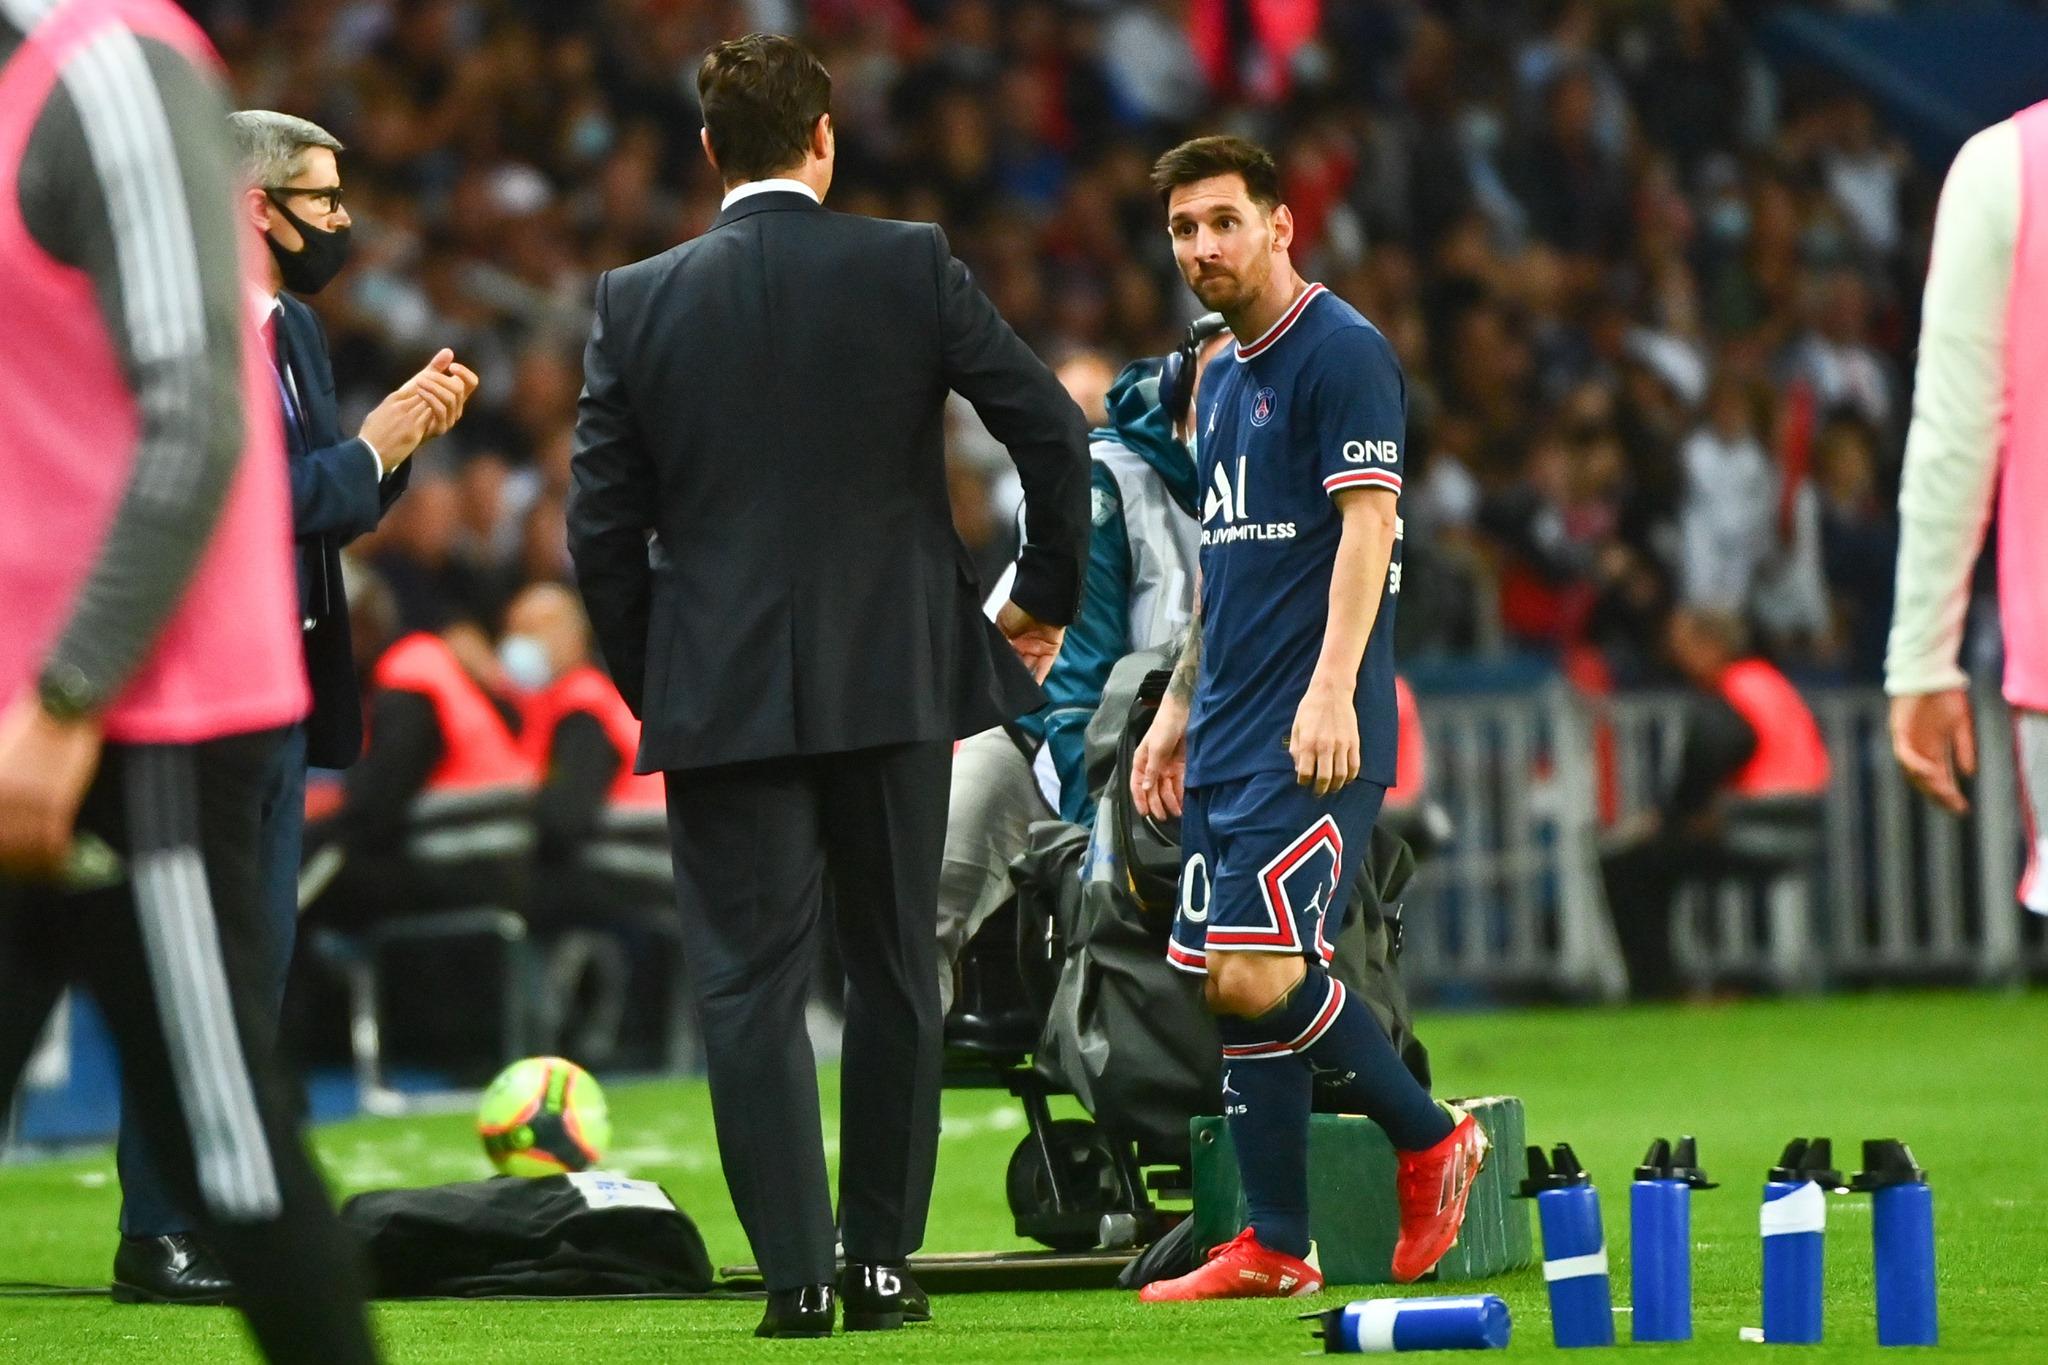 PSG-ah Messi a ropui dawn em? – Zara